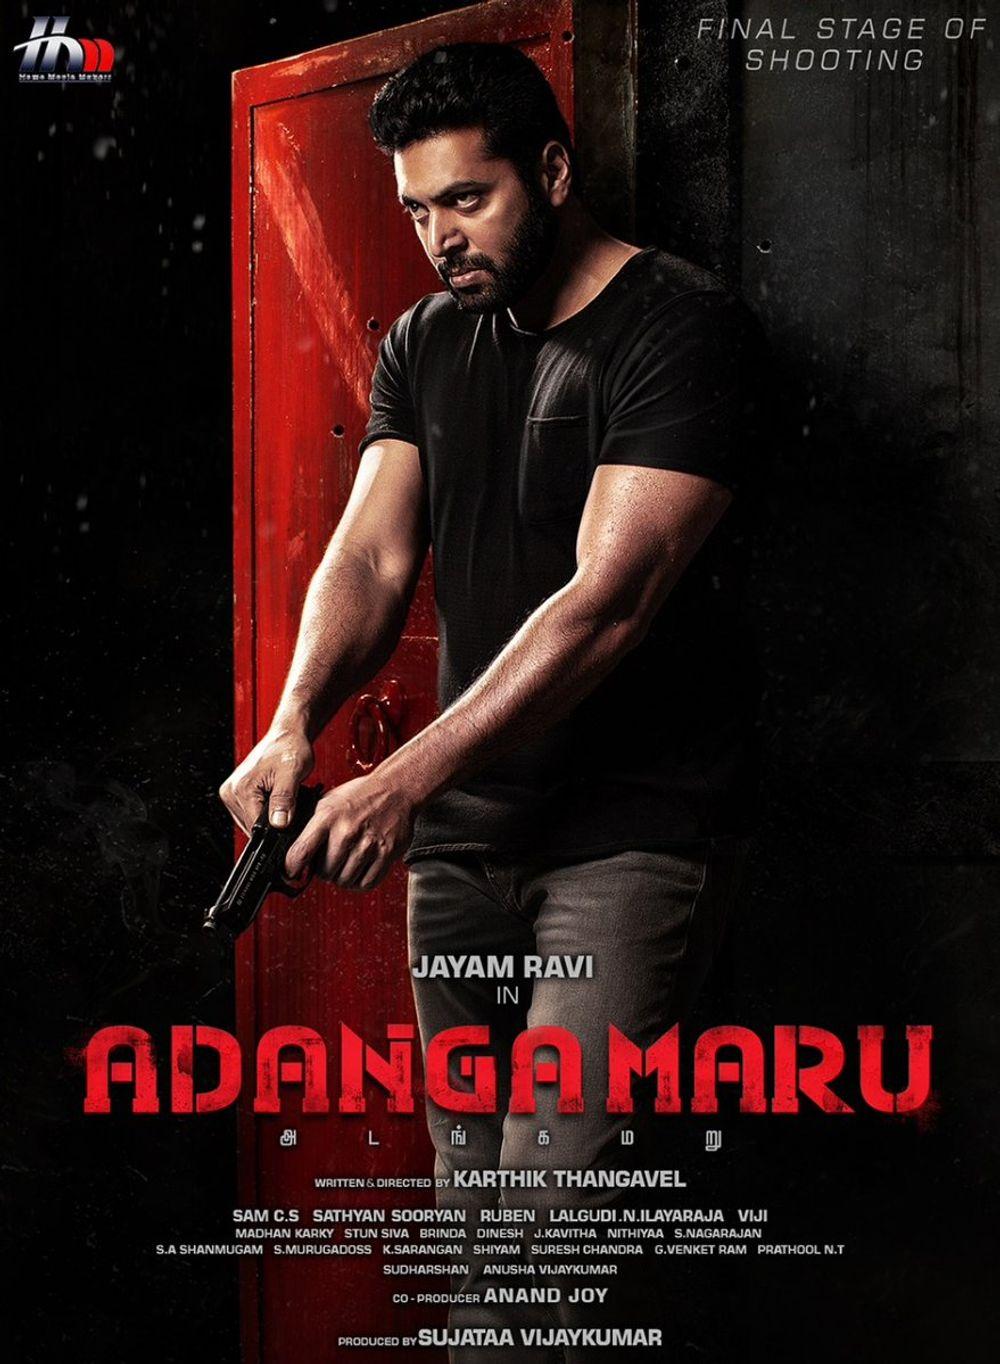 Adanga Maru (2020) Hindi Dubbed Movie HDRip 720p AAC